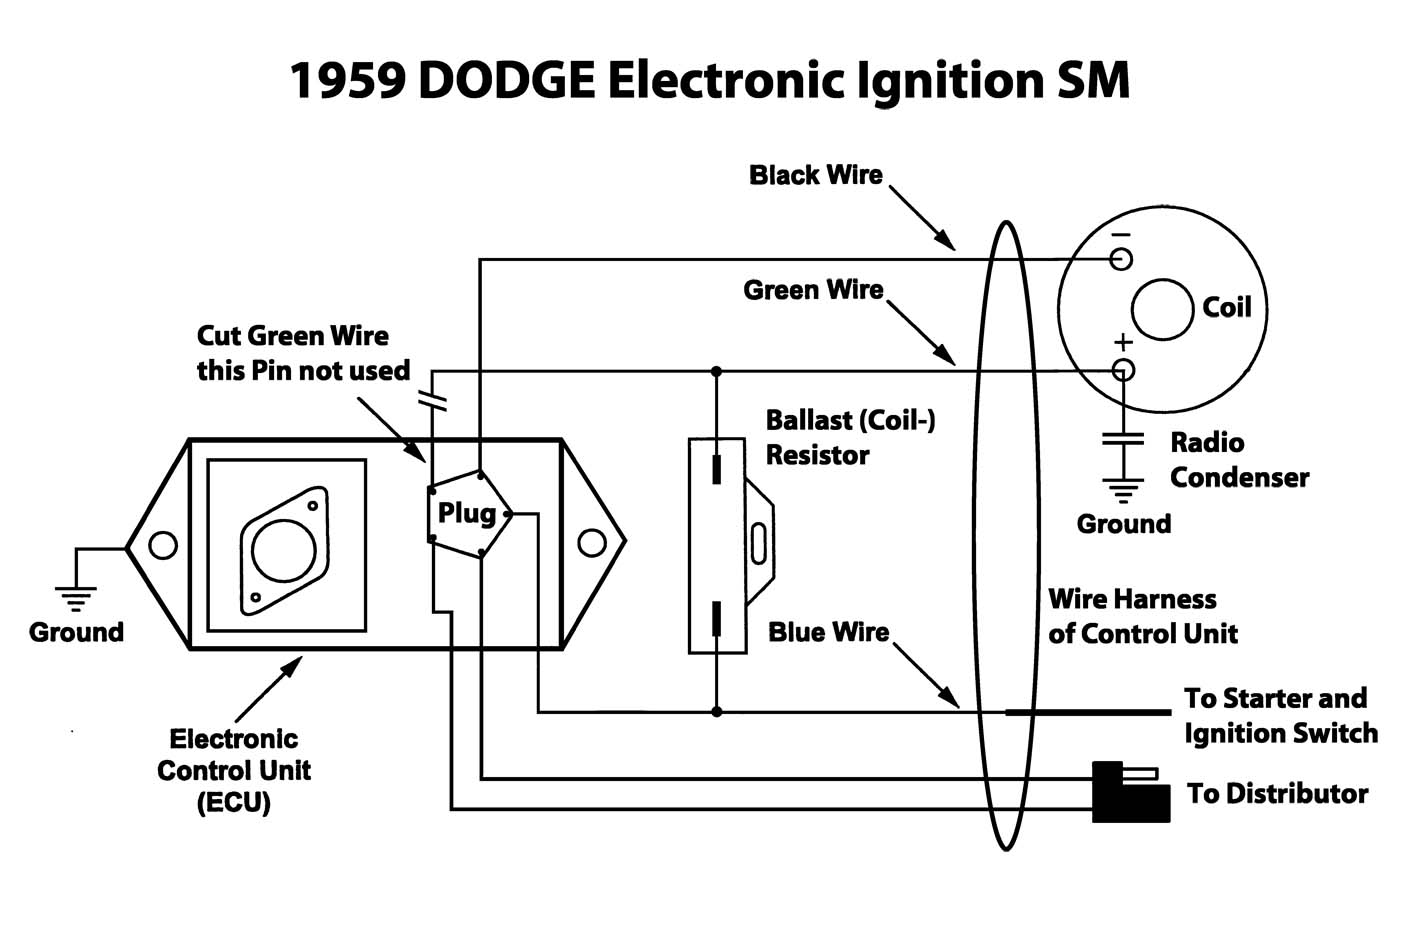 1978 Dodge Ignition Switch Wiring Diagram 1995 Dodge Ram